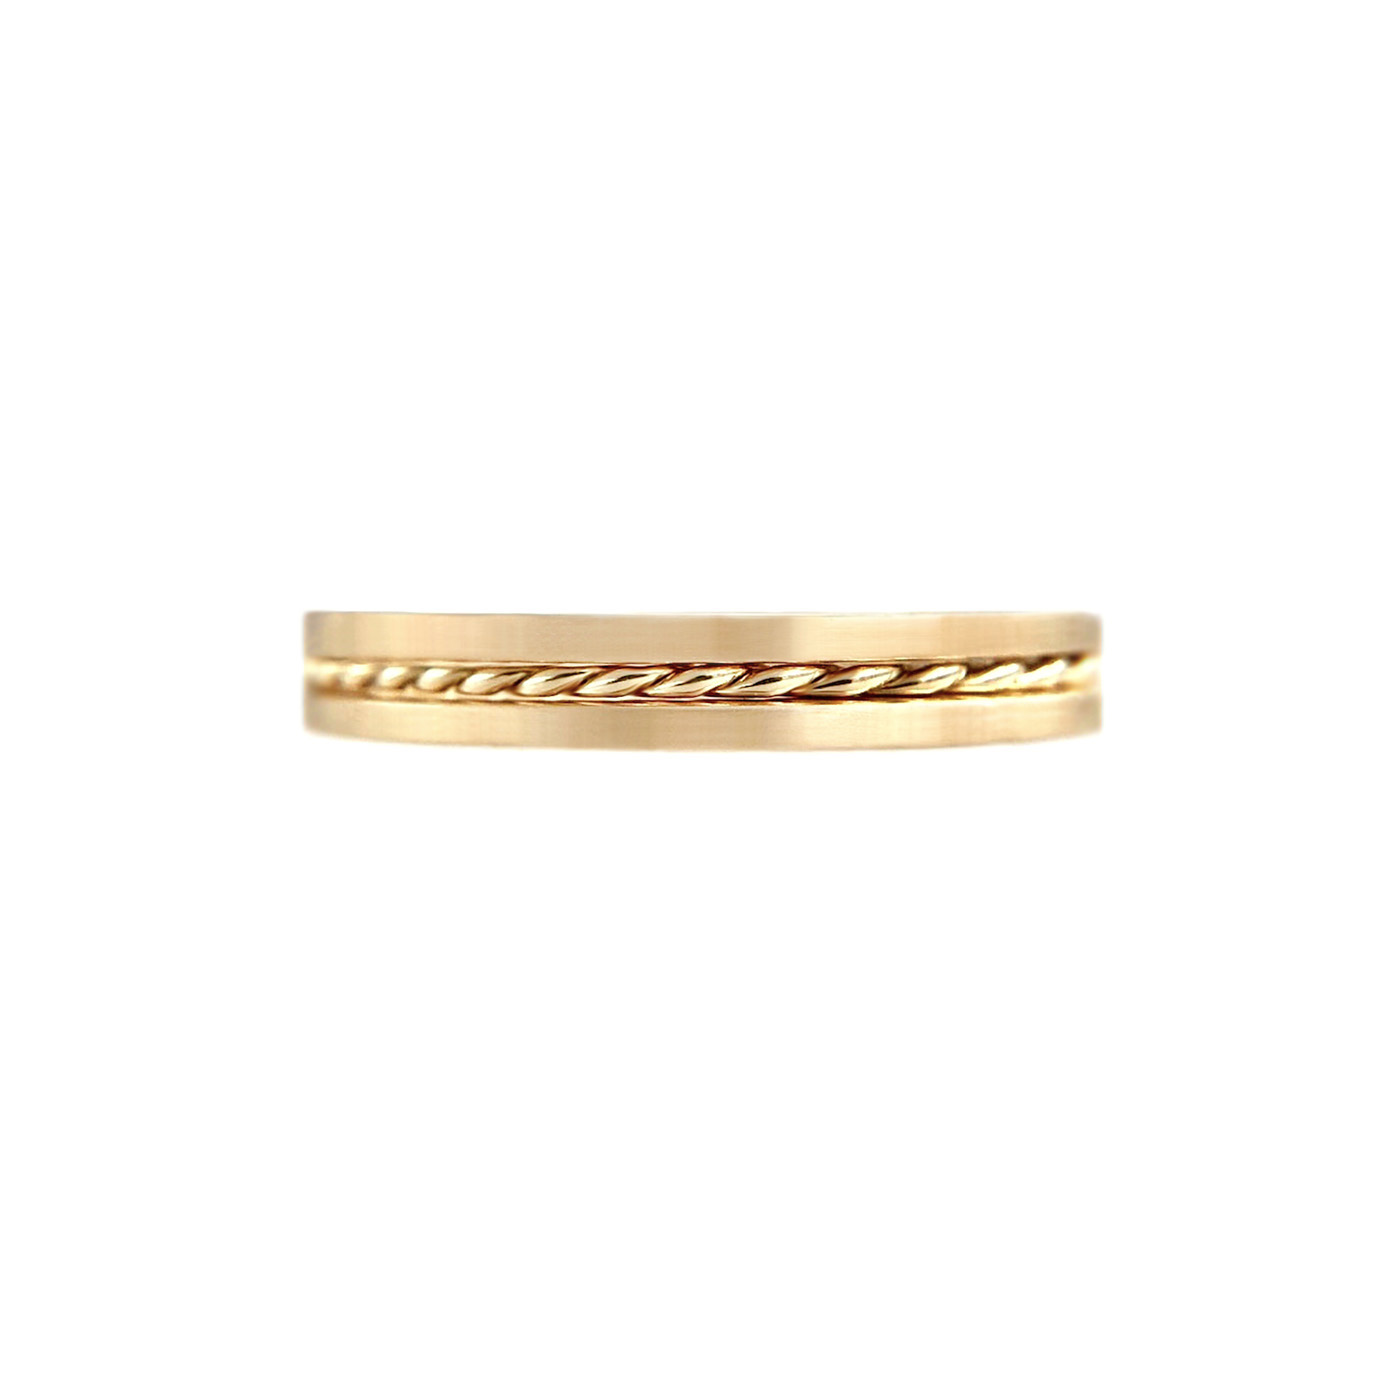 PIROUETTE-42.50.42-Slim-Twist-Satin-Stripe-Band-Three-Ring-Stacking-014k-18k-JeweLyrie_9218